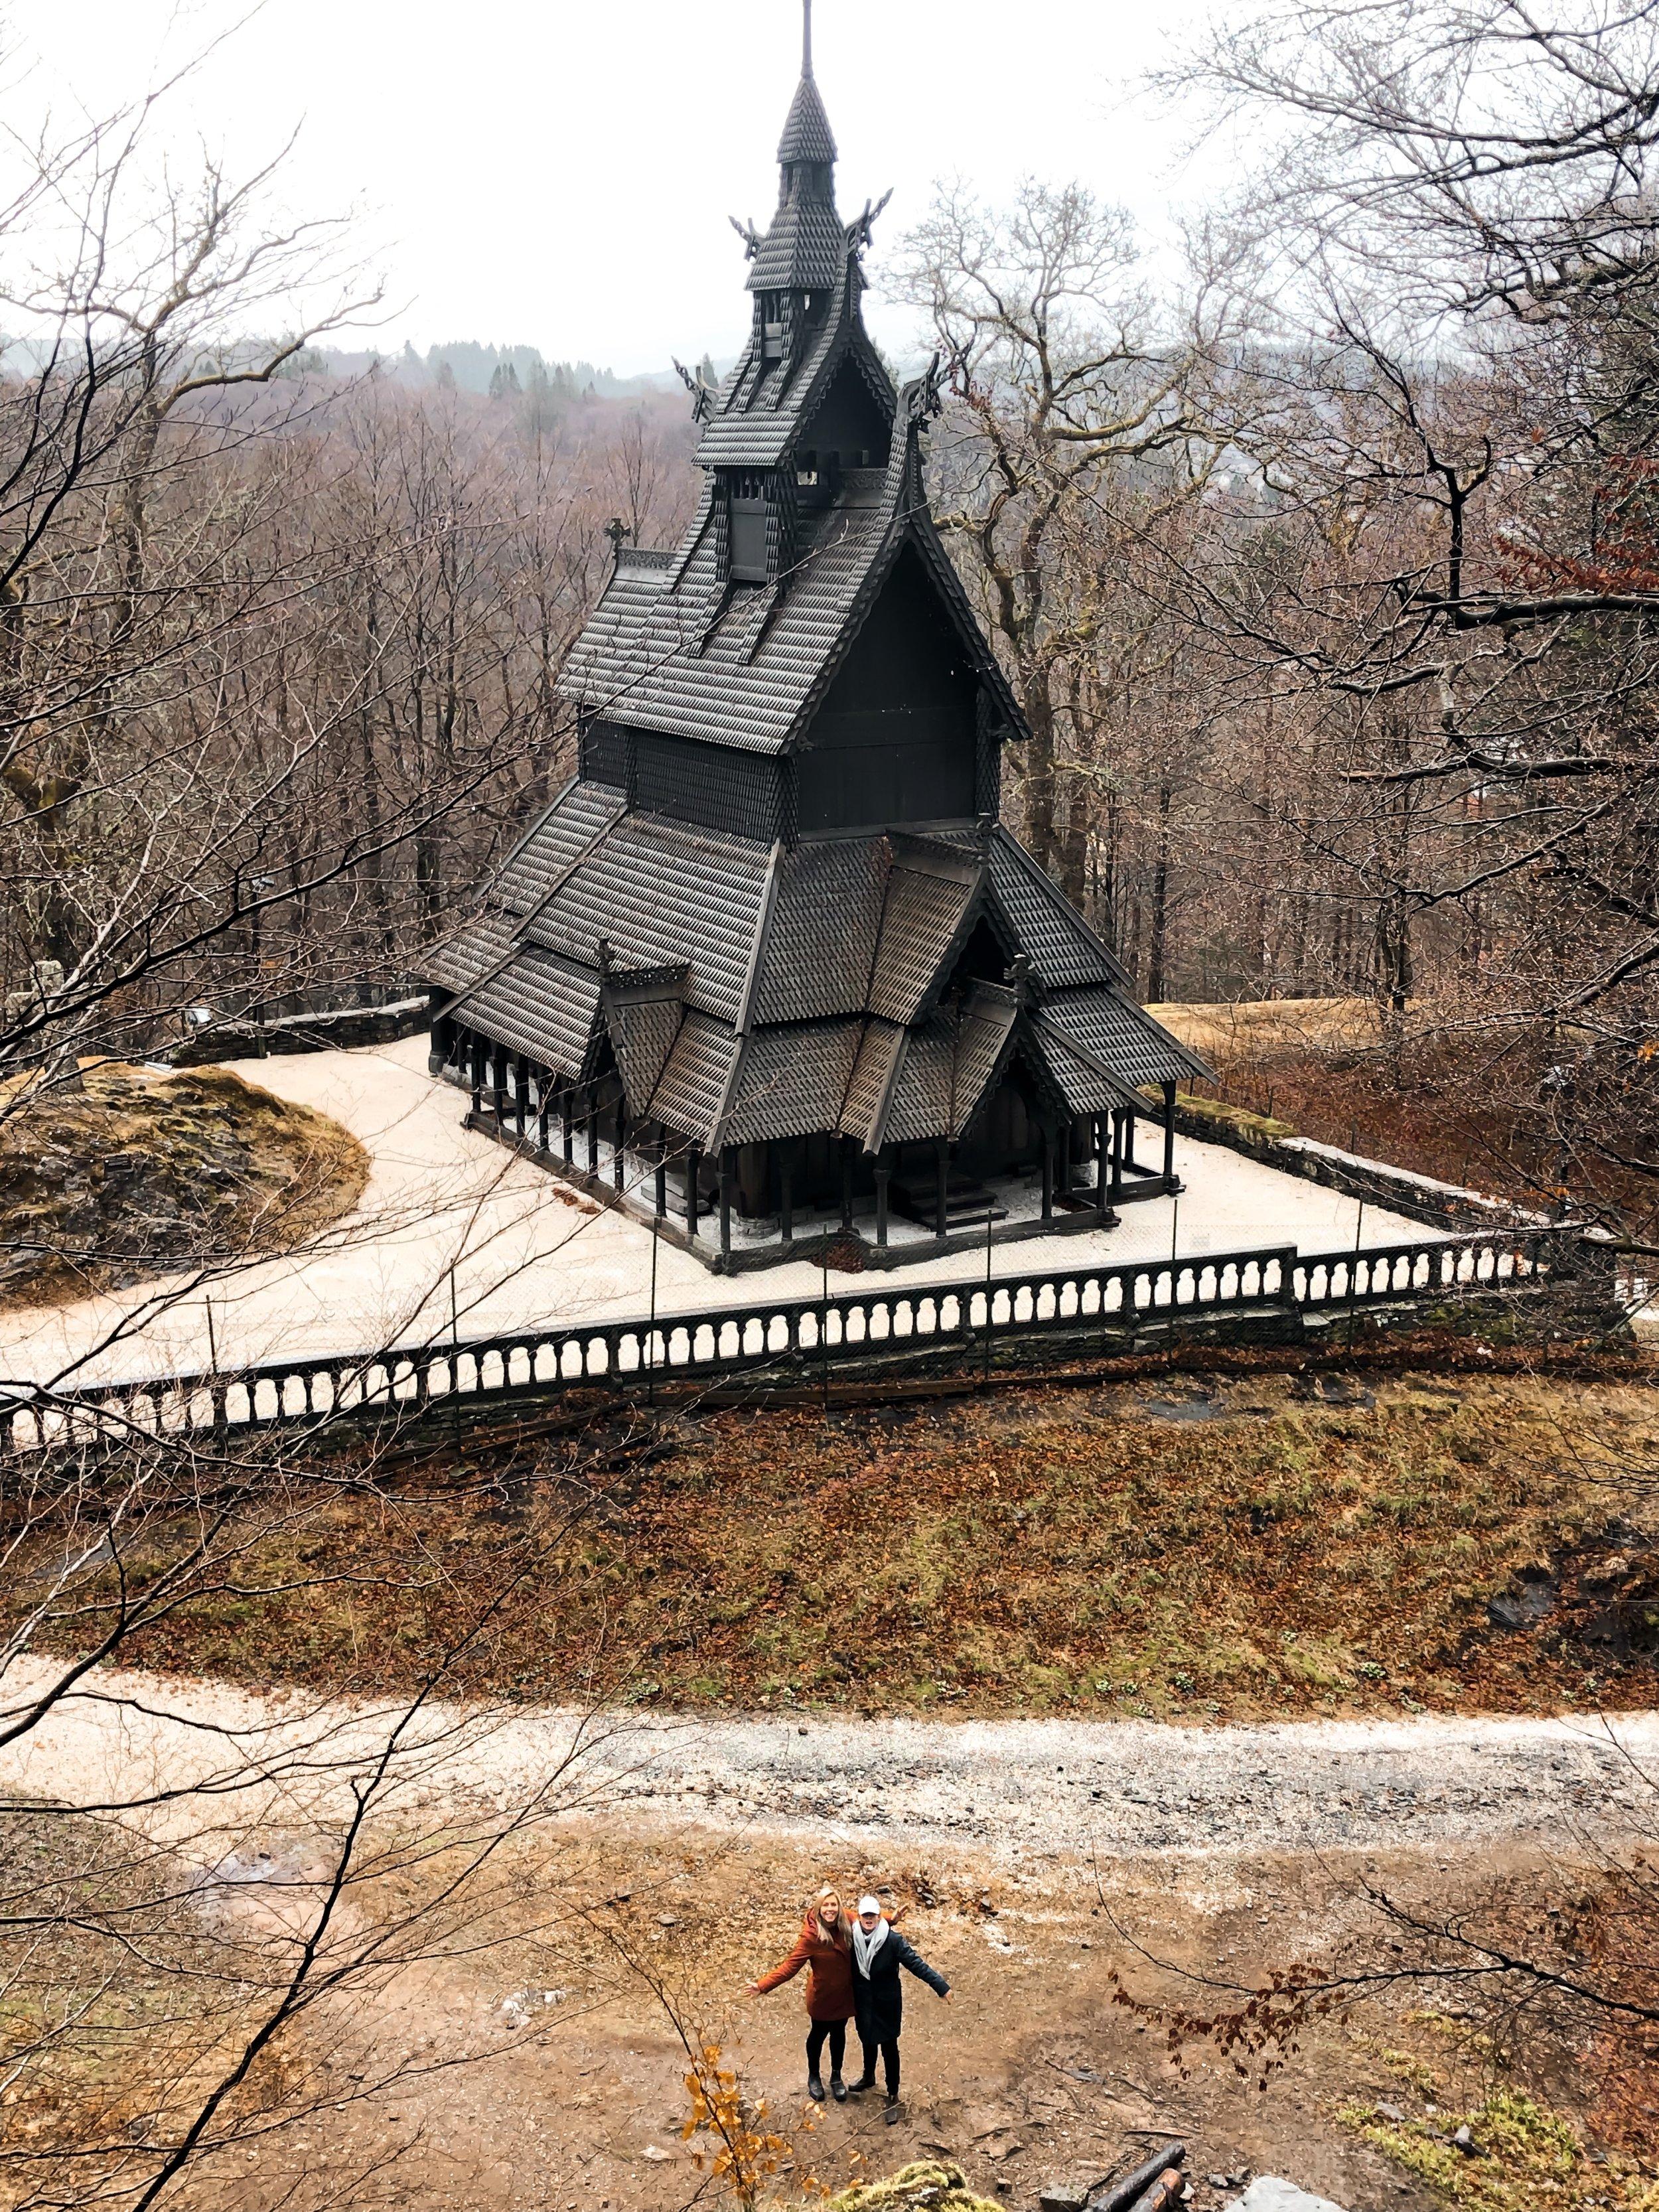 The gorgeous, unique stave church in Fantoft